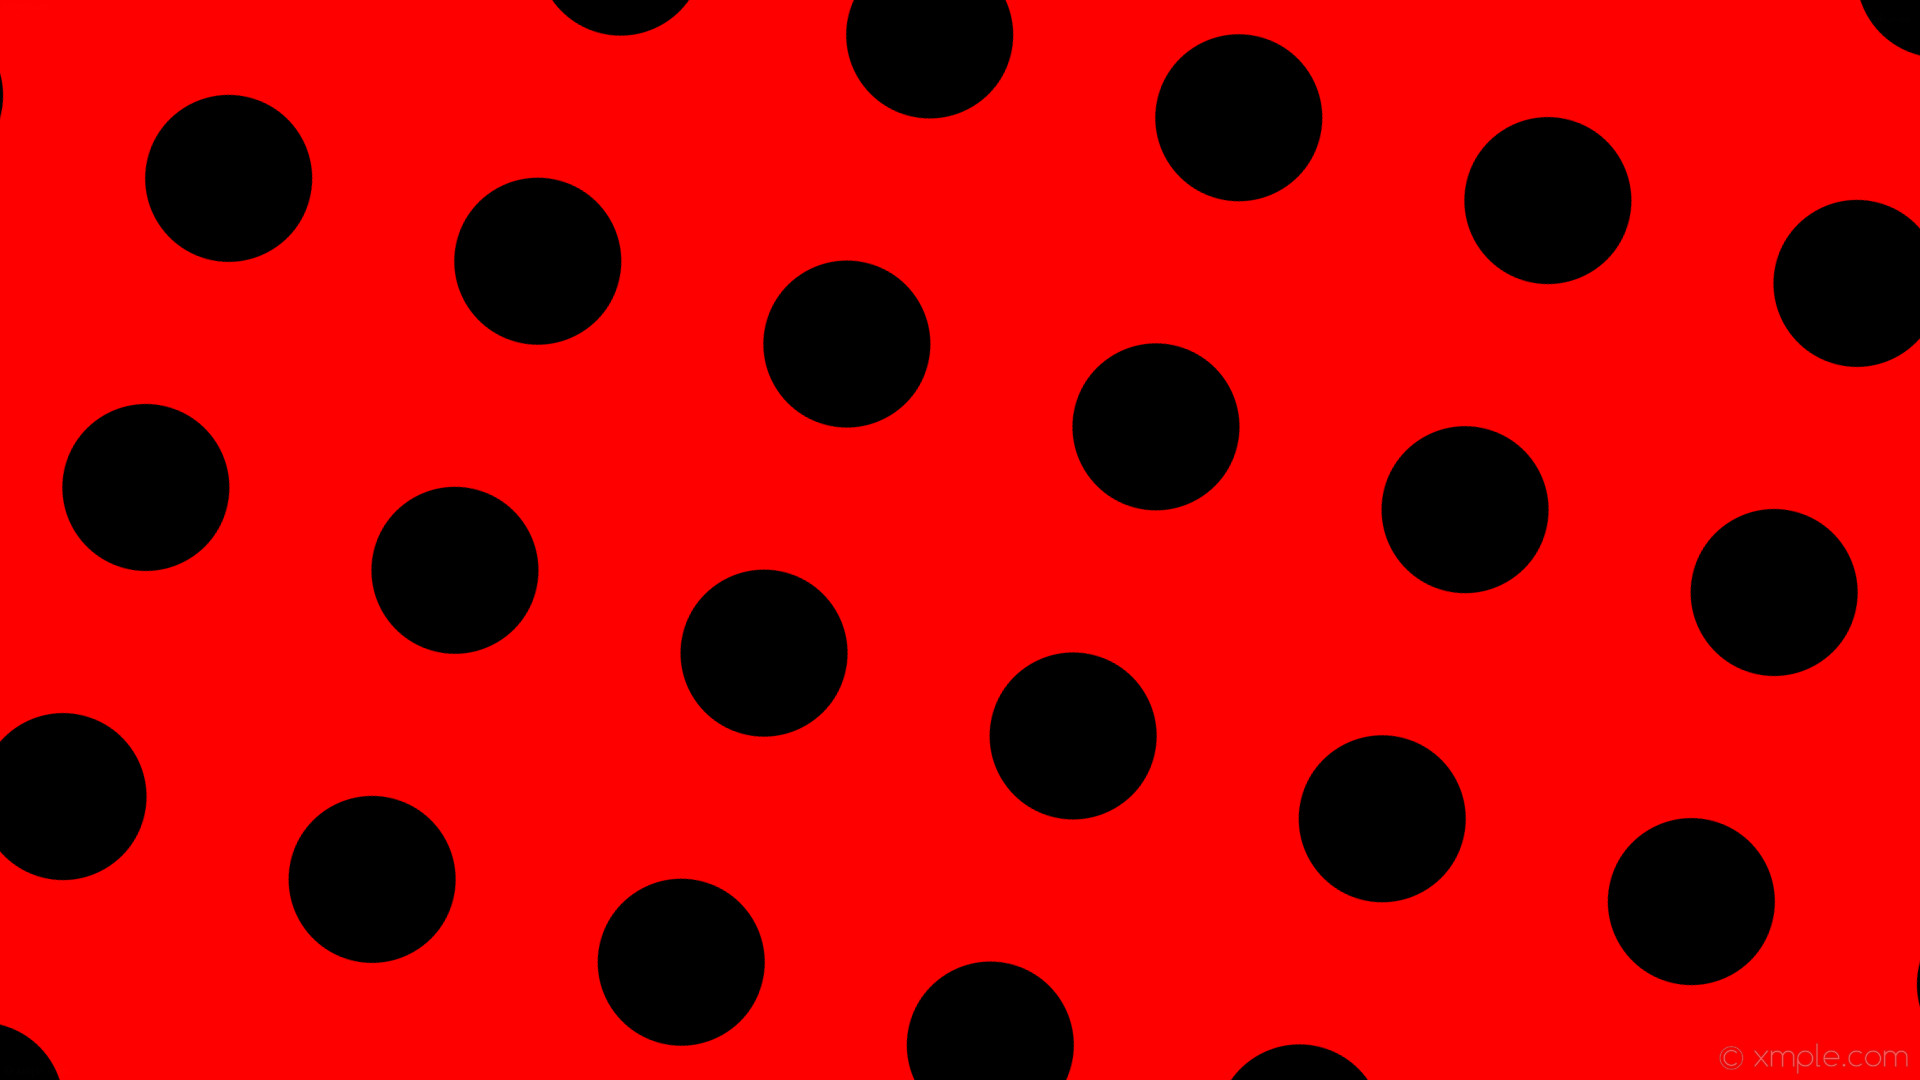 wallpaper dots red polka black spots #ff0000 #000000 255° 167px 320px